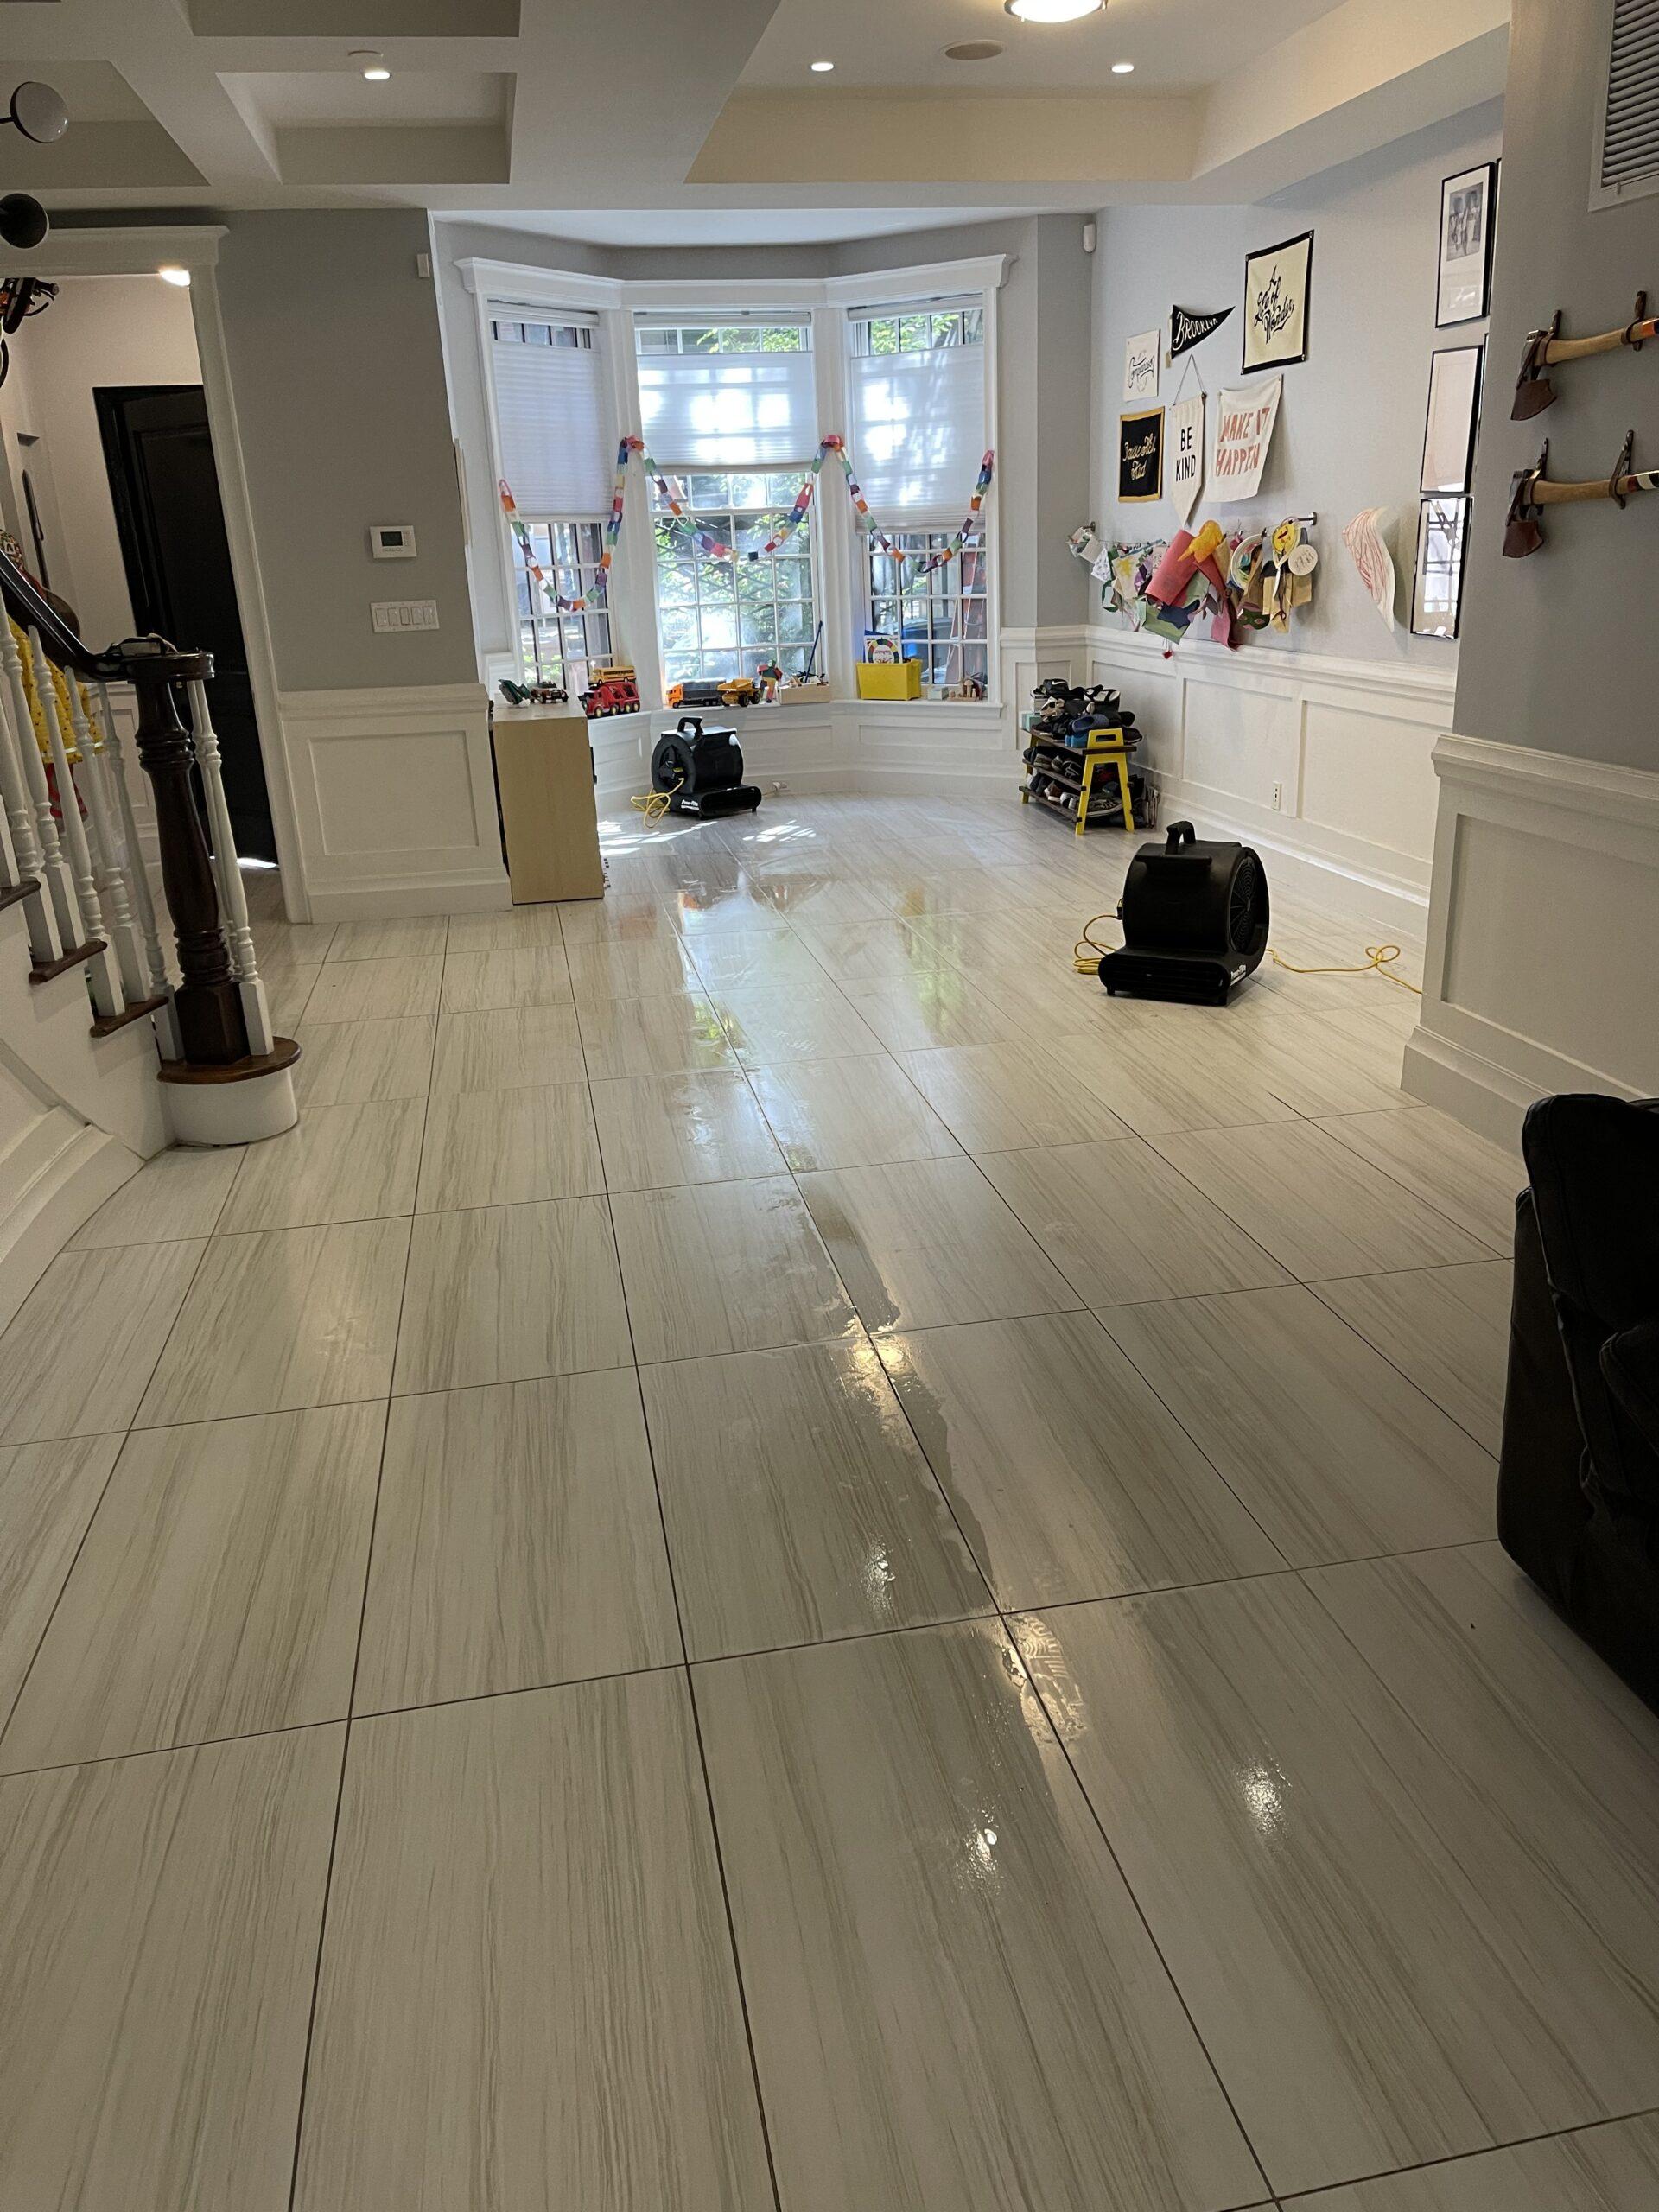 Indoor Mold Specialist- Mold Remediation Brooklyn, NY